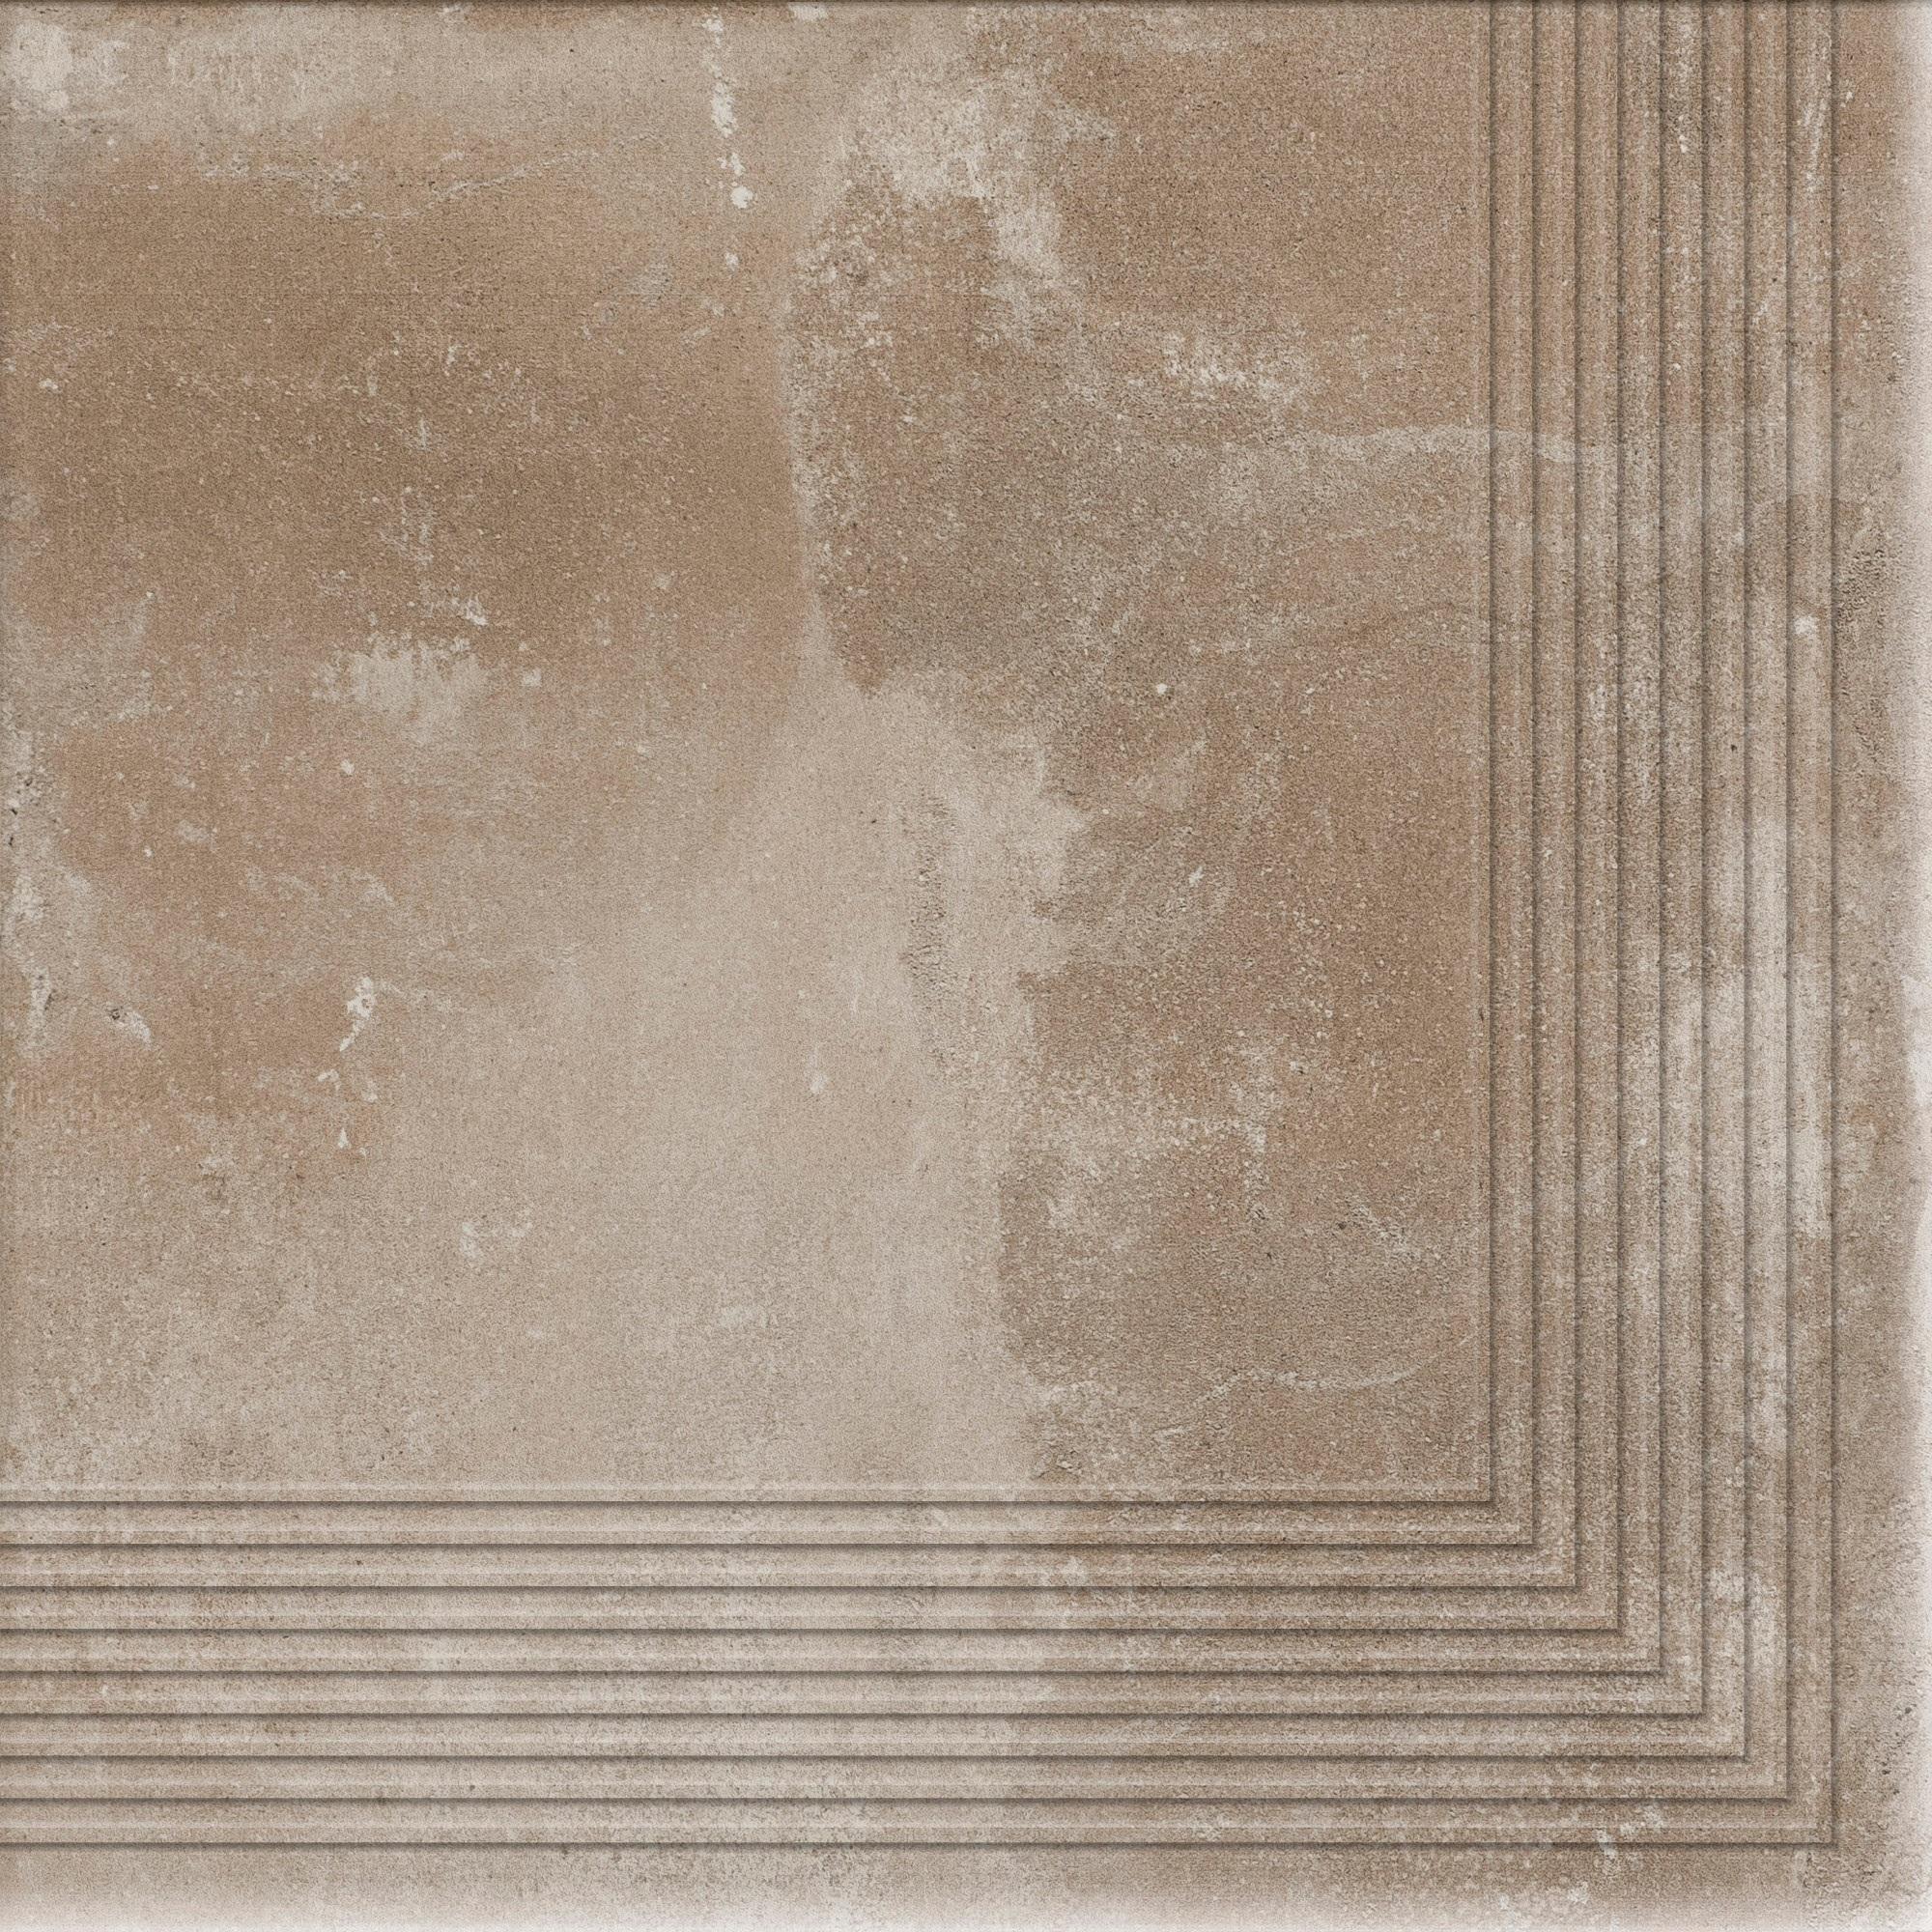 Piatto Sand Stopnica Narozna